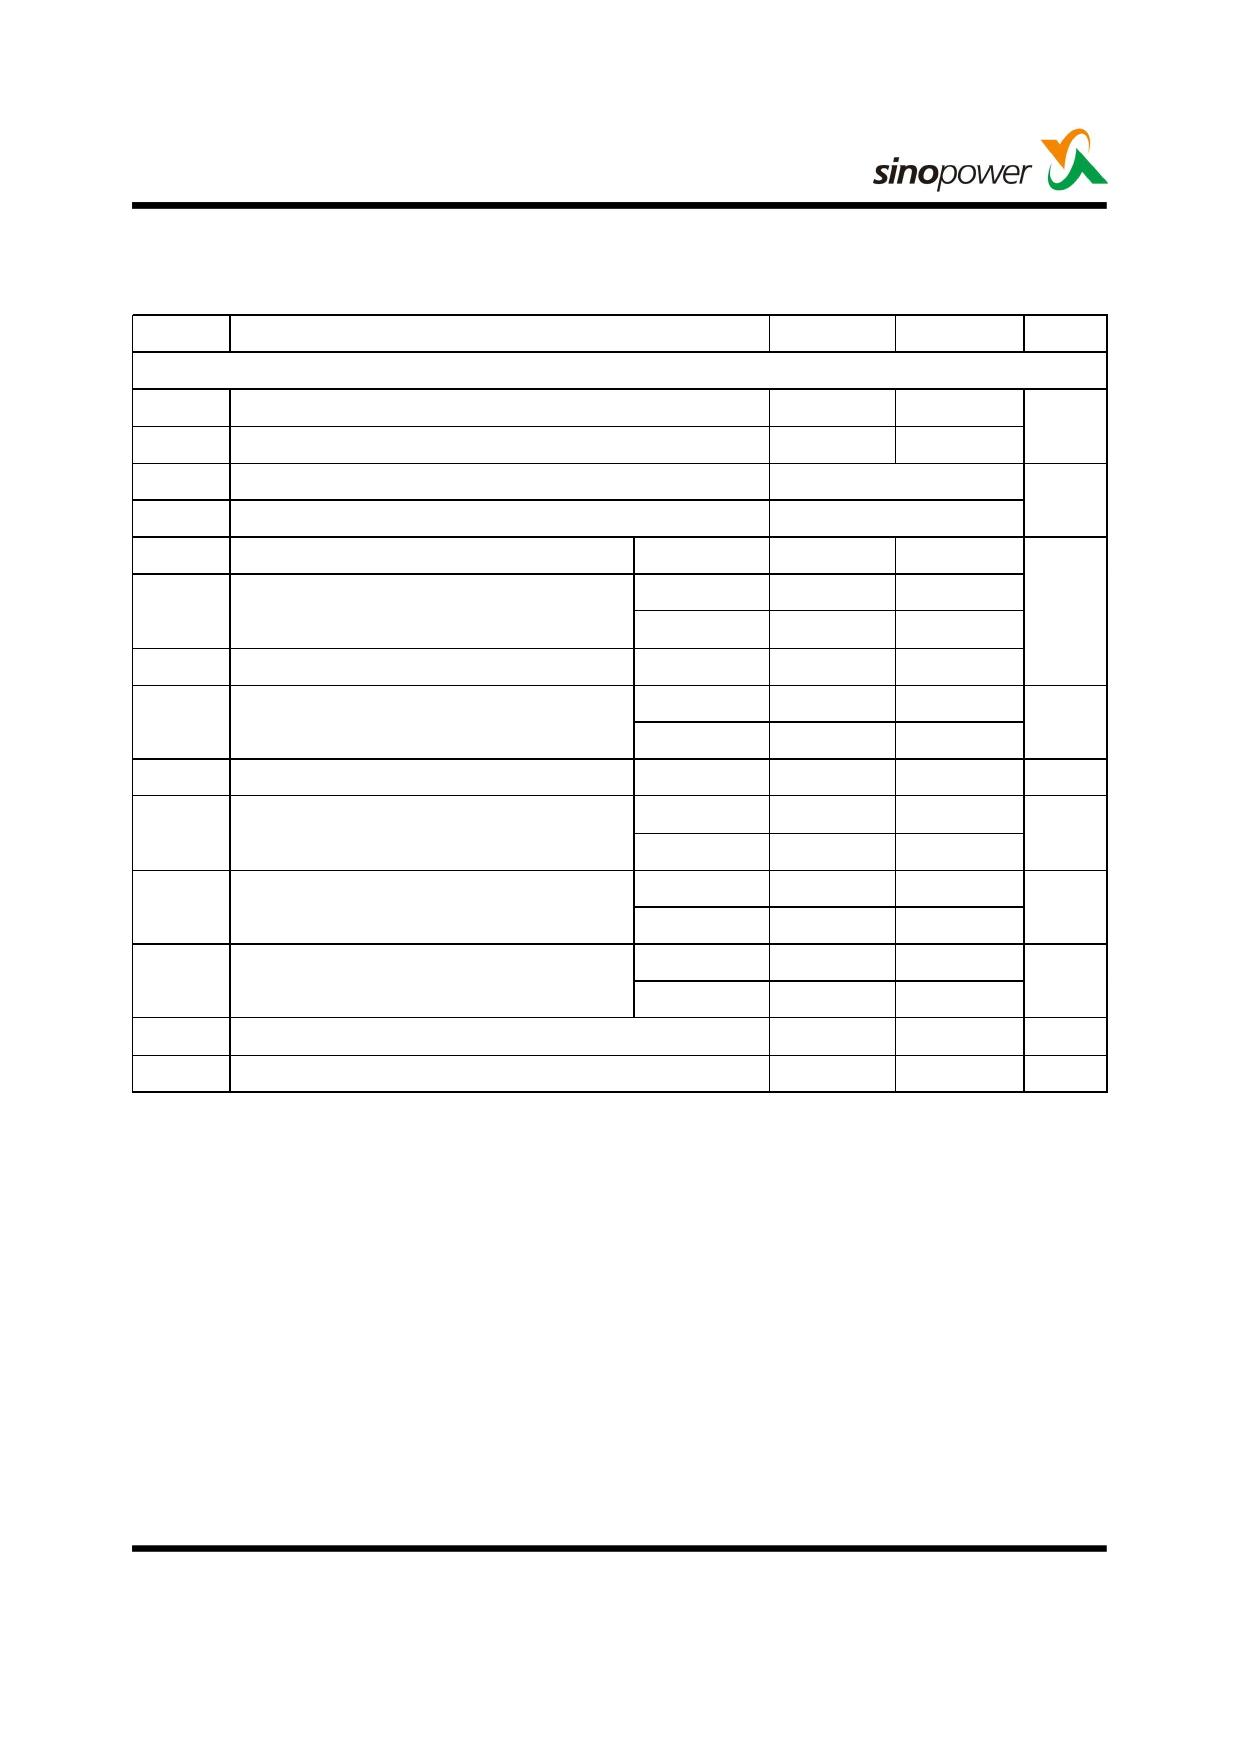 SM7304ESKP pdf, equivalent, schematic